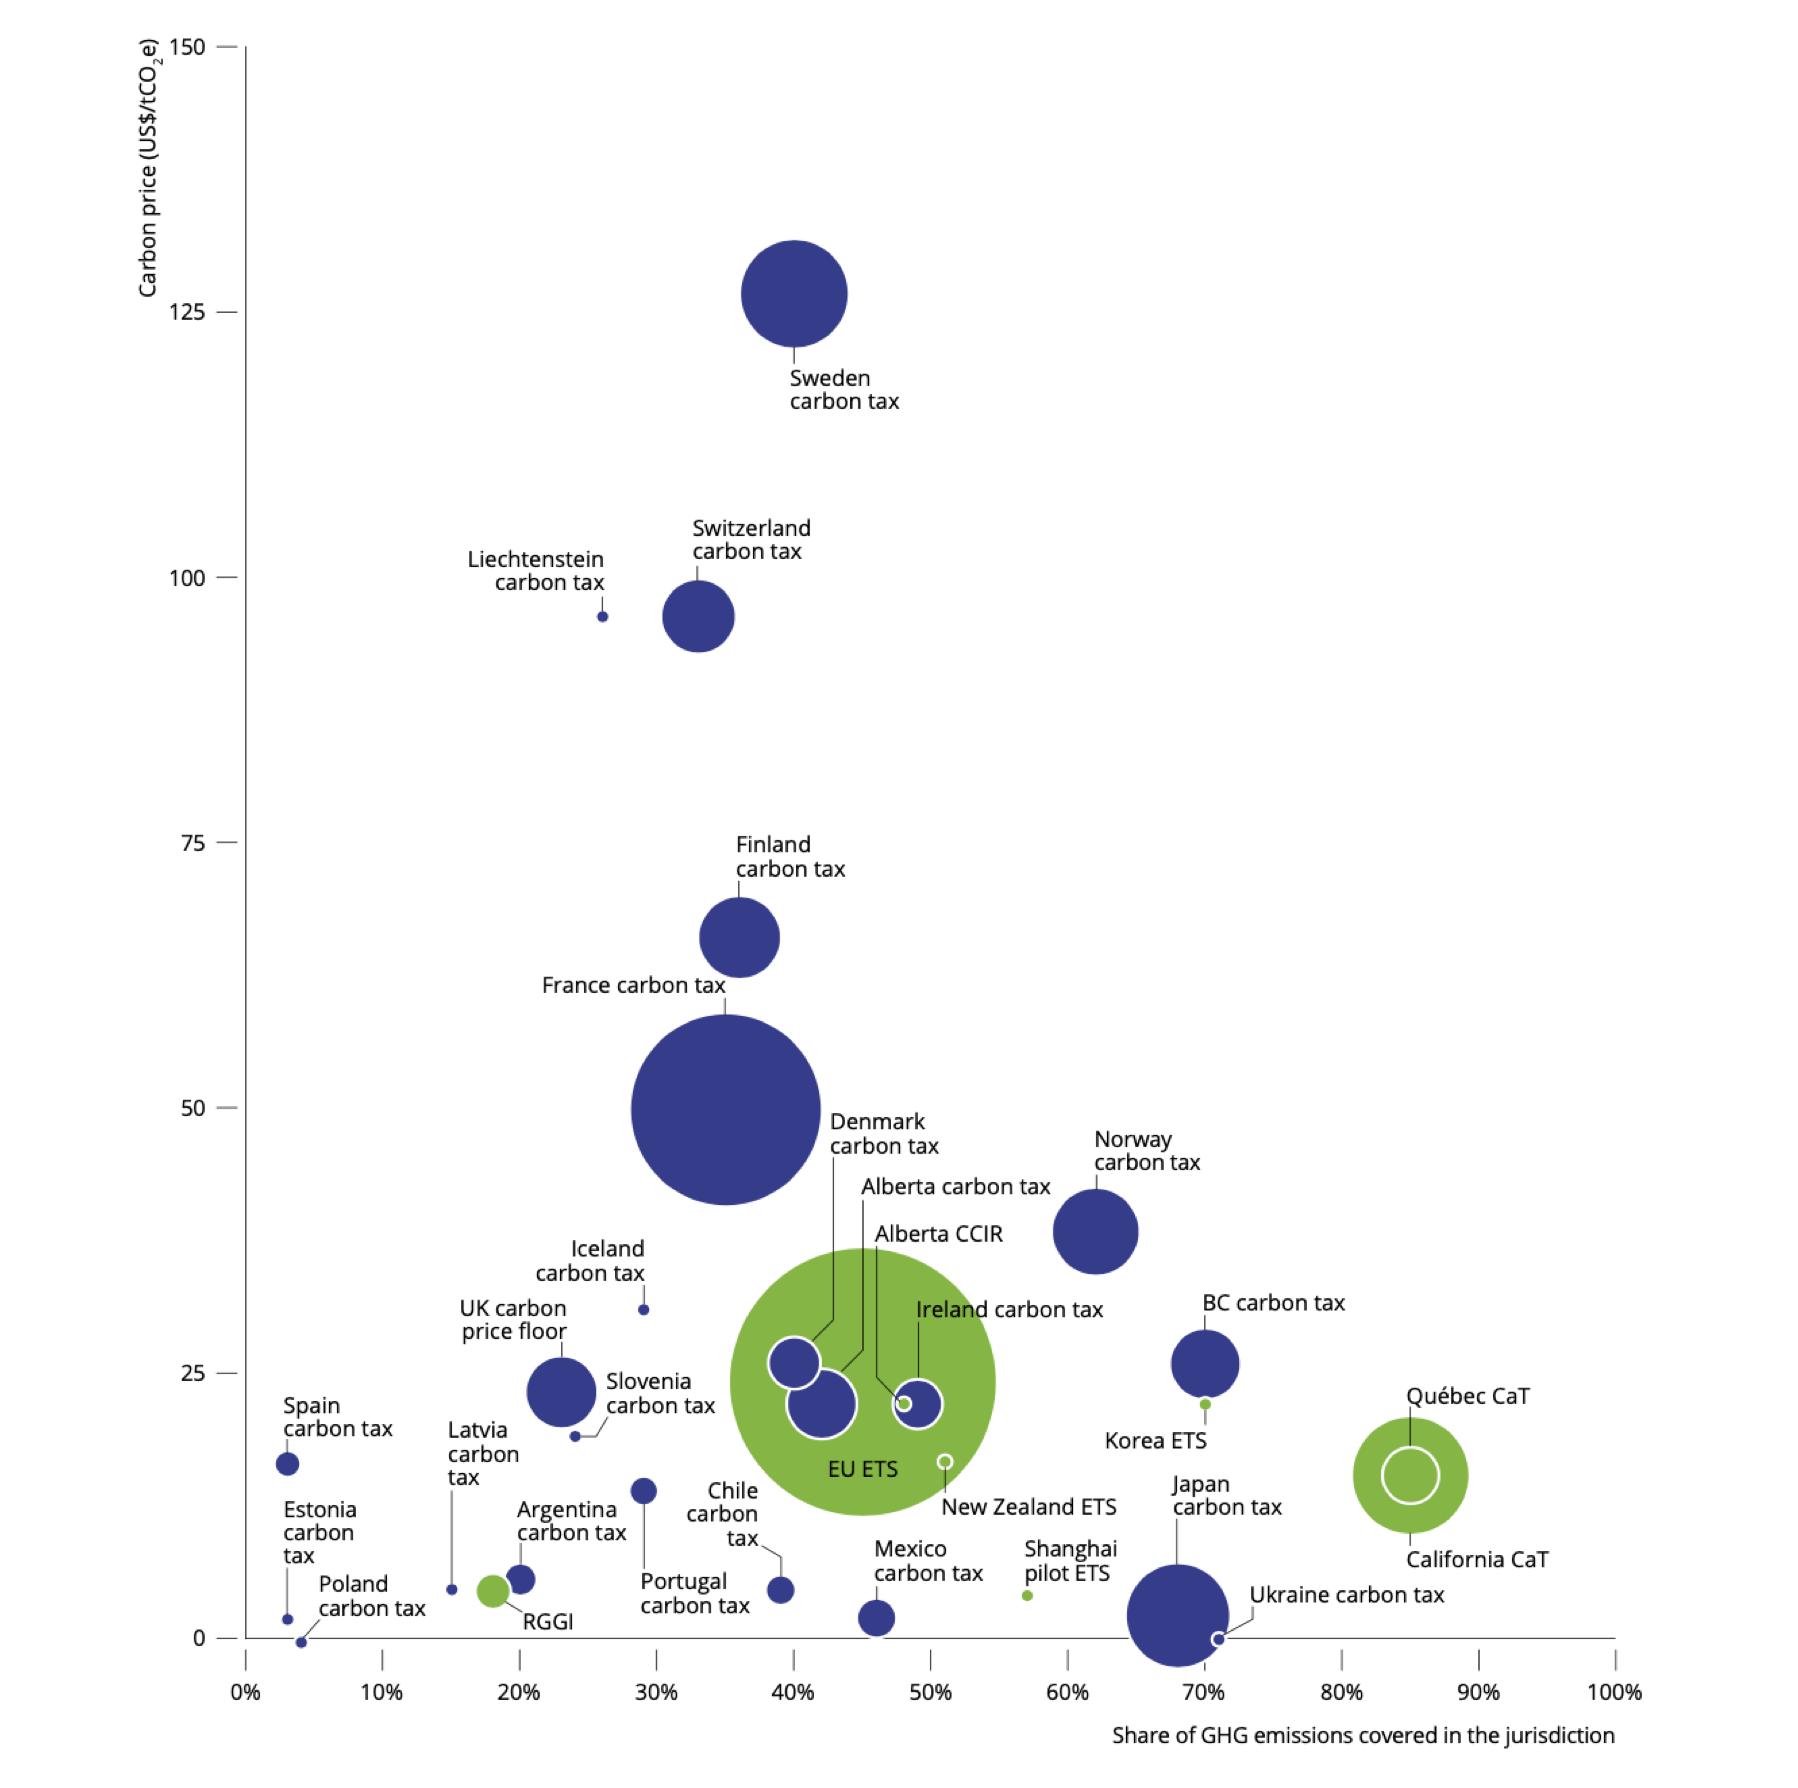 Carbon prices around the world